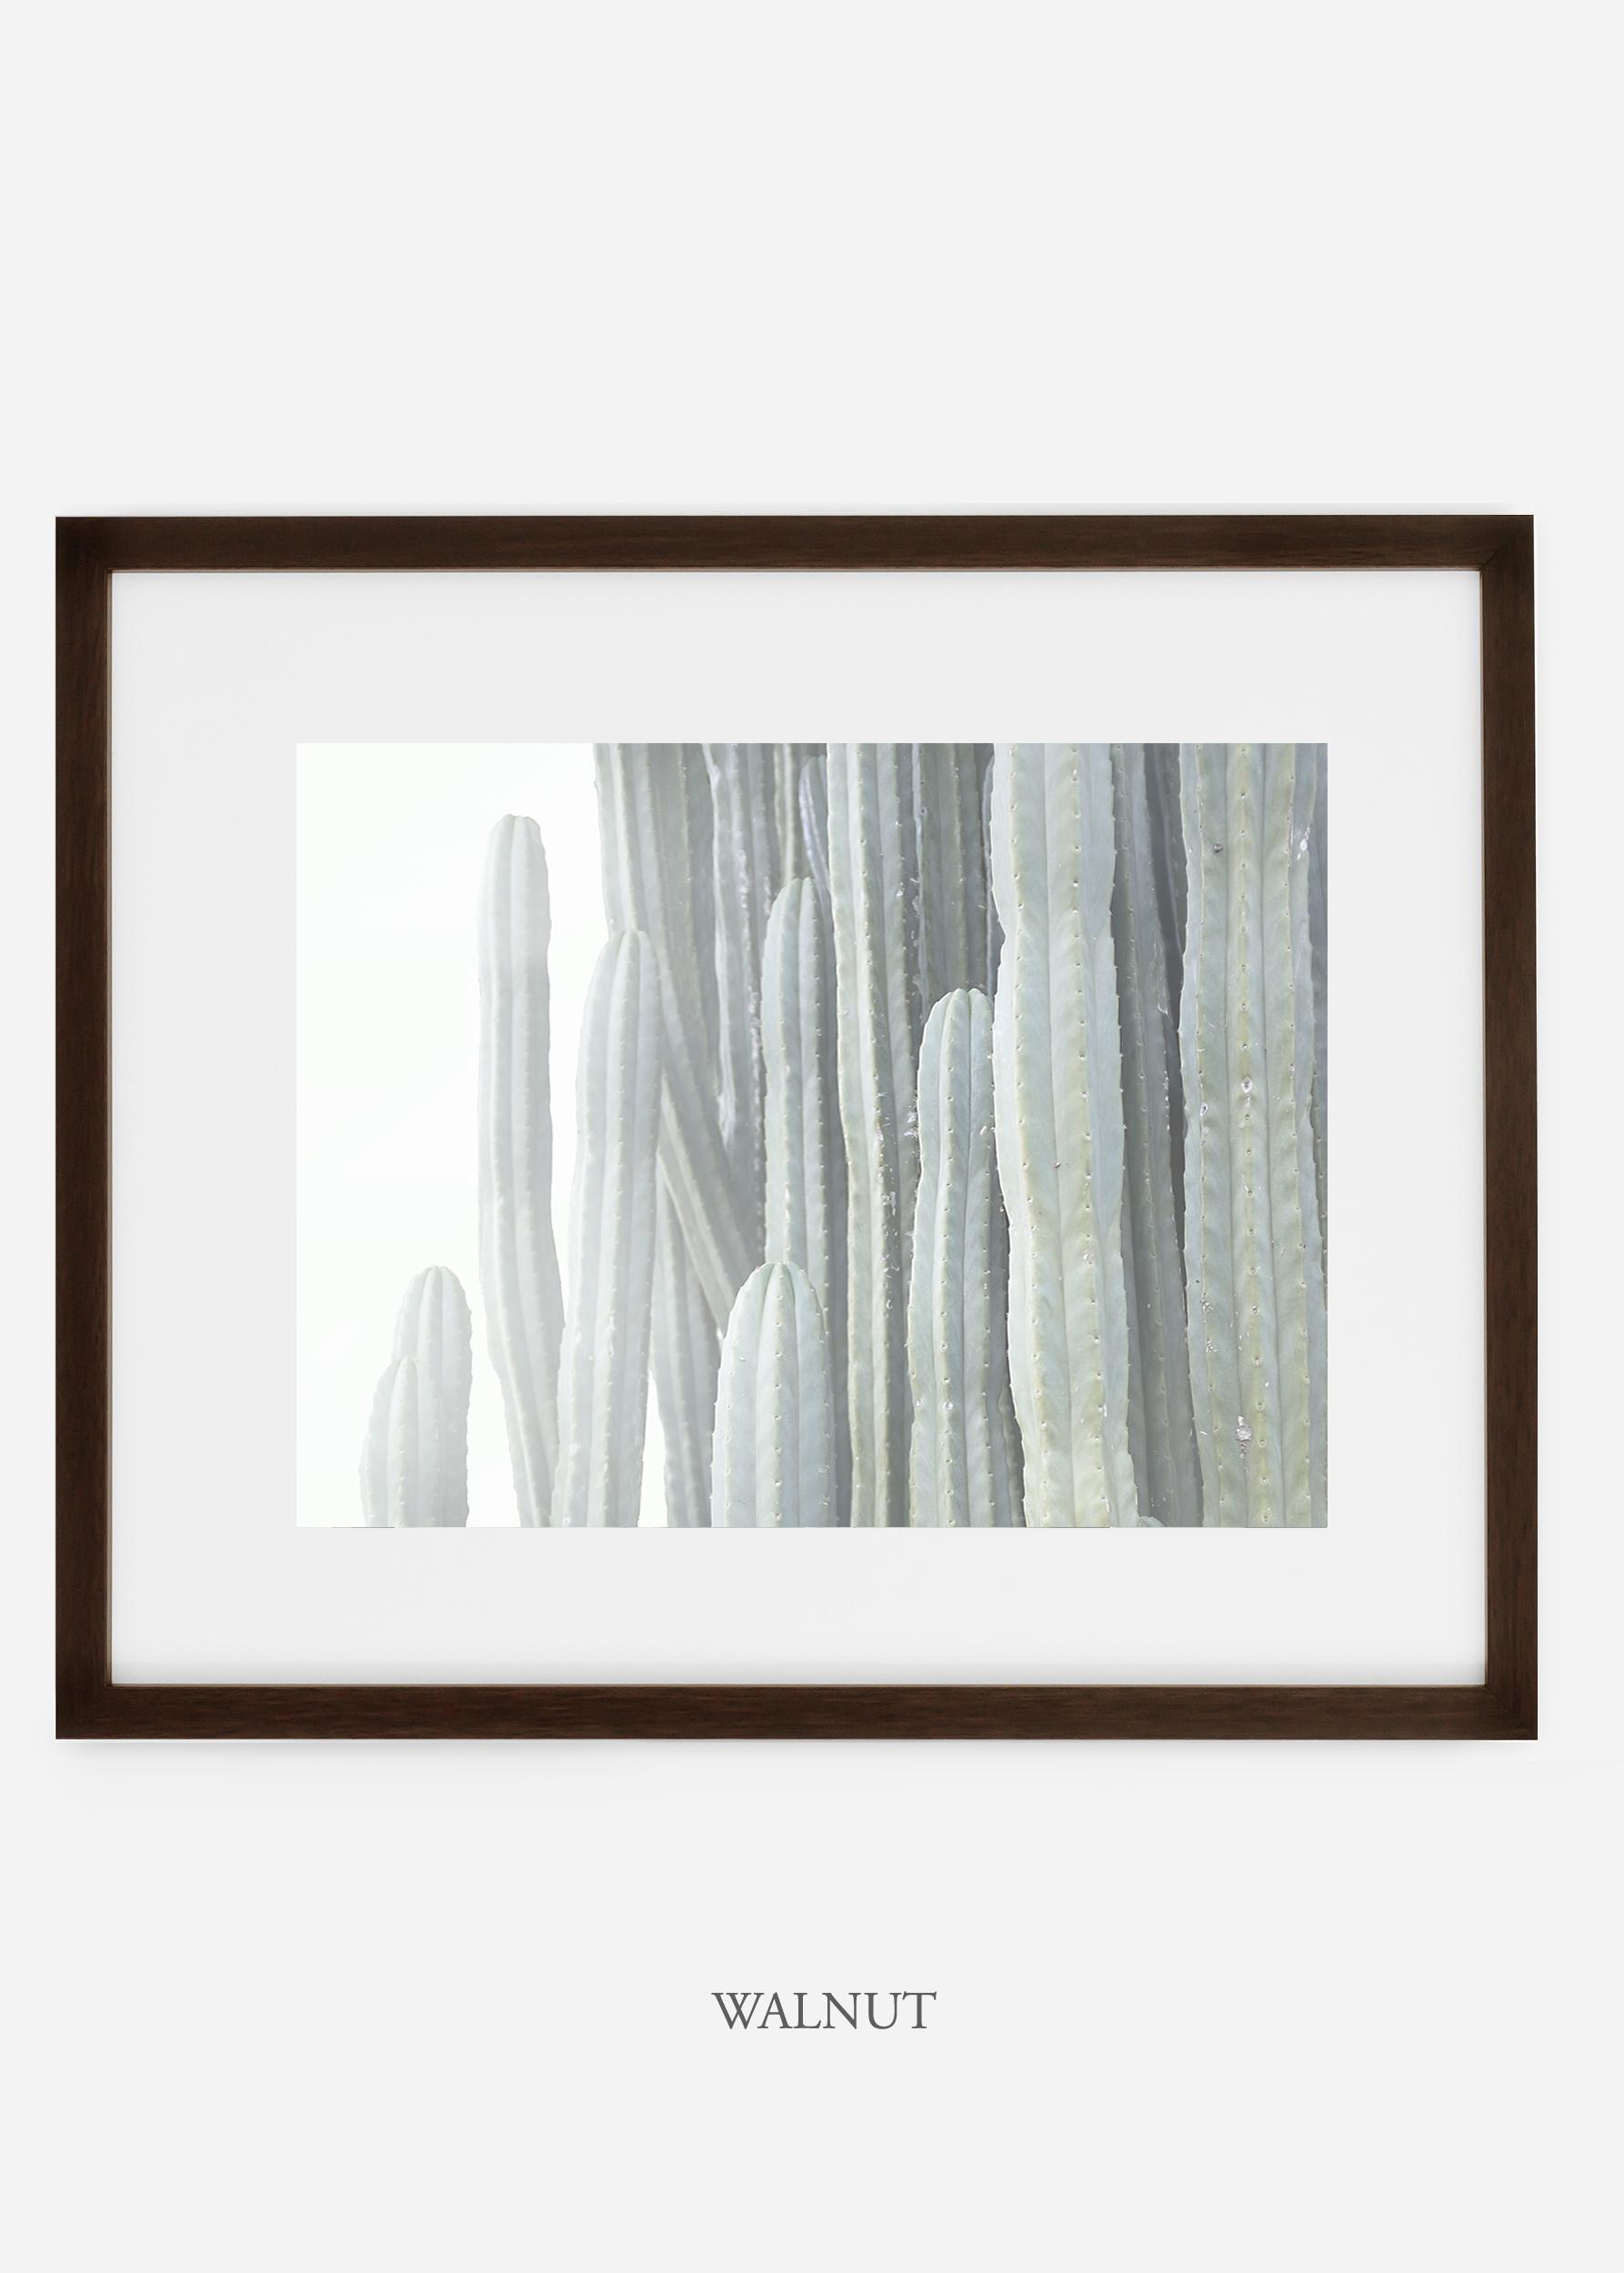 WilderCalifornia_walnutframe__Cactus_Art_Photography_interiordesign_white_bohemian_neutral_photography_photo.jpg